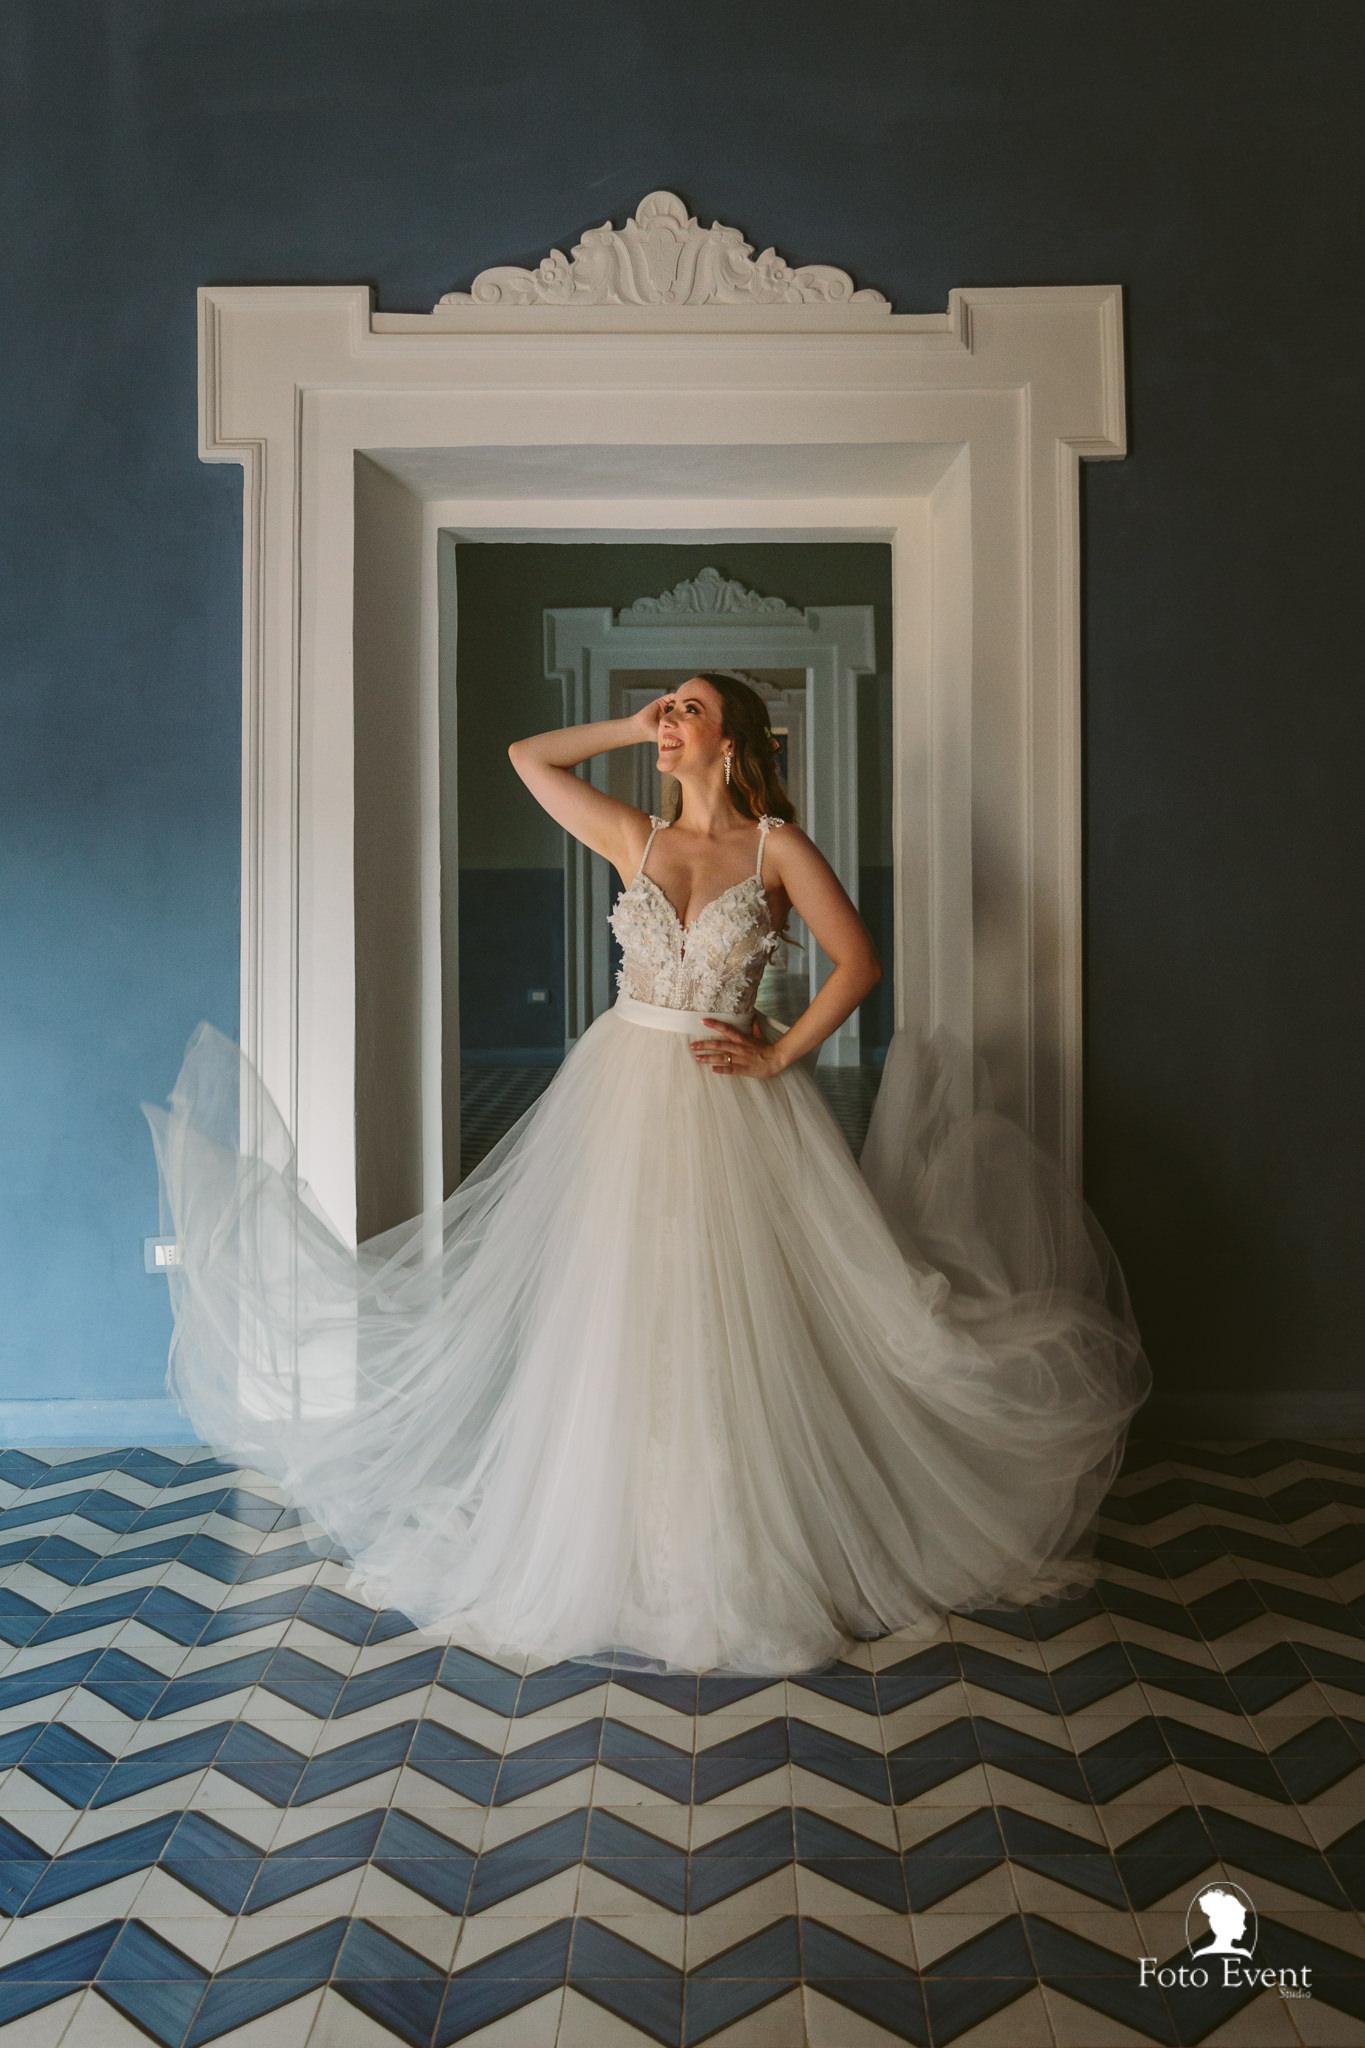 044-2019-08-22-Matrimonio-Angela-e-Nicola-Iaconis-1454